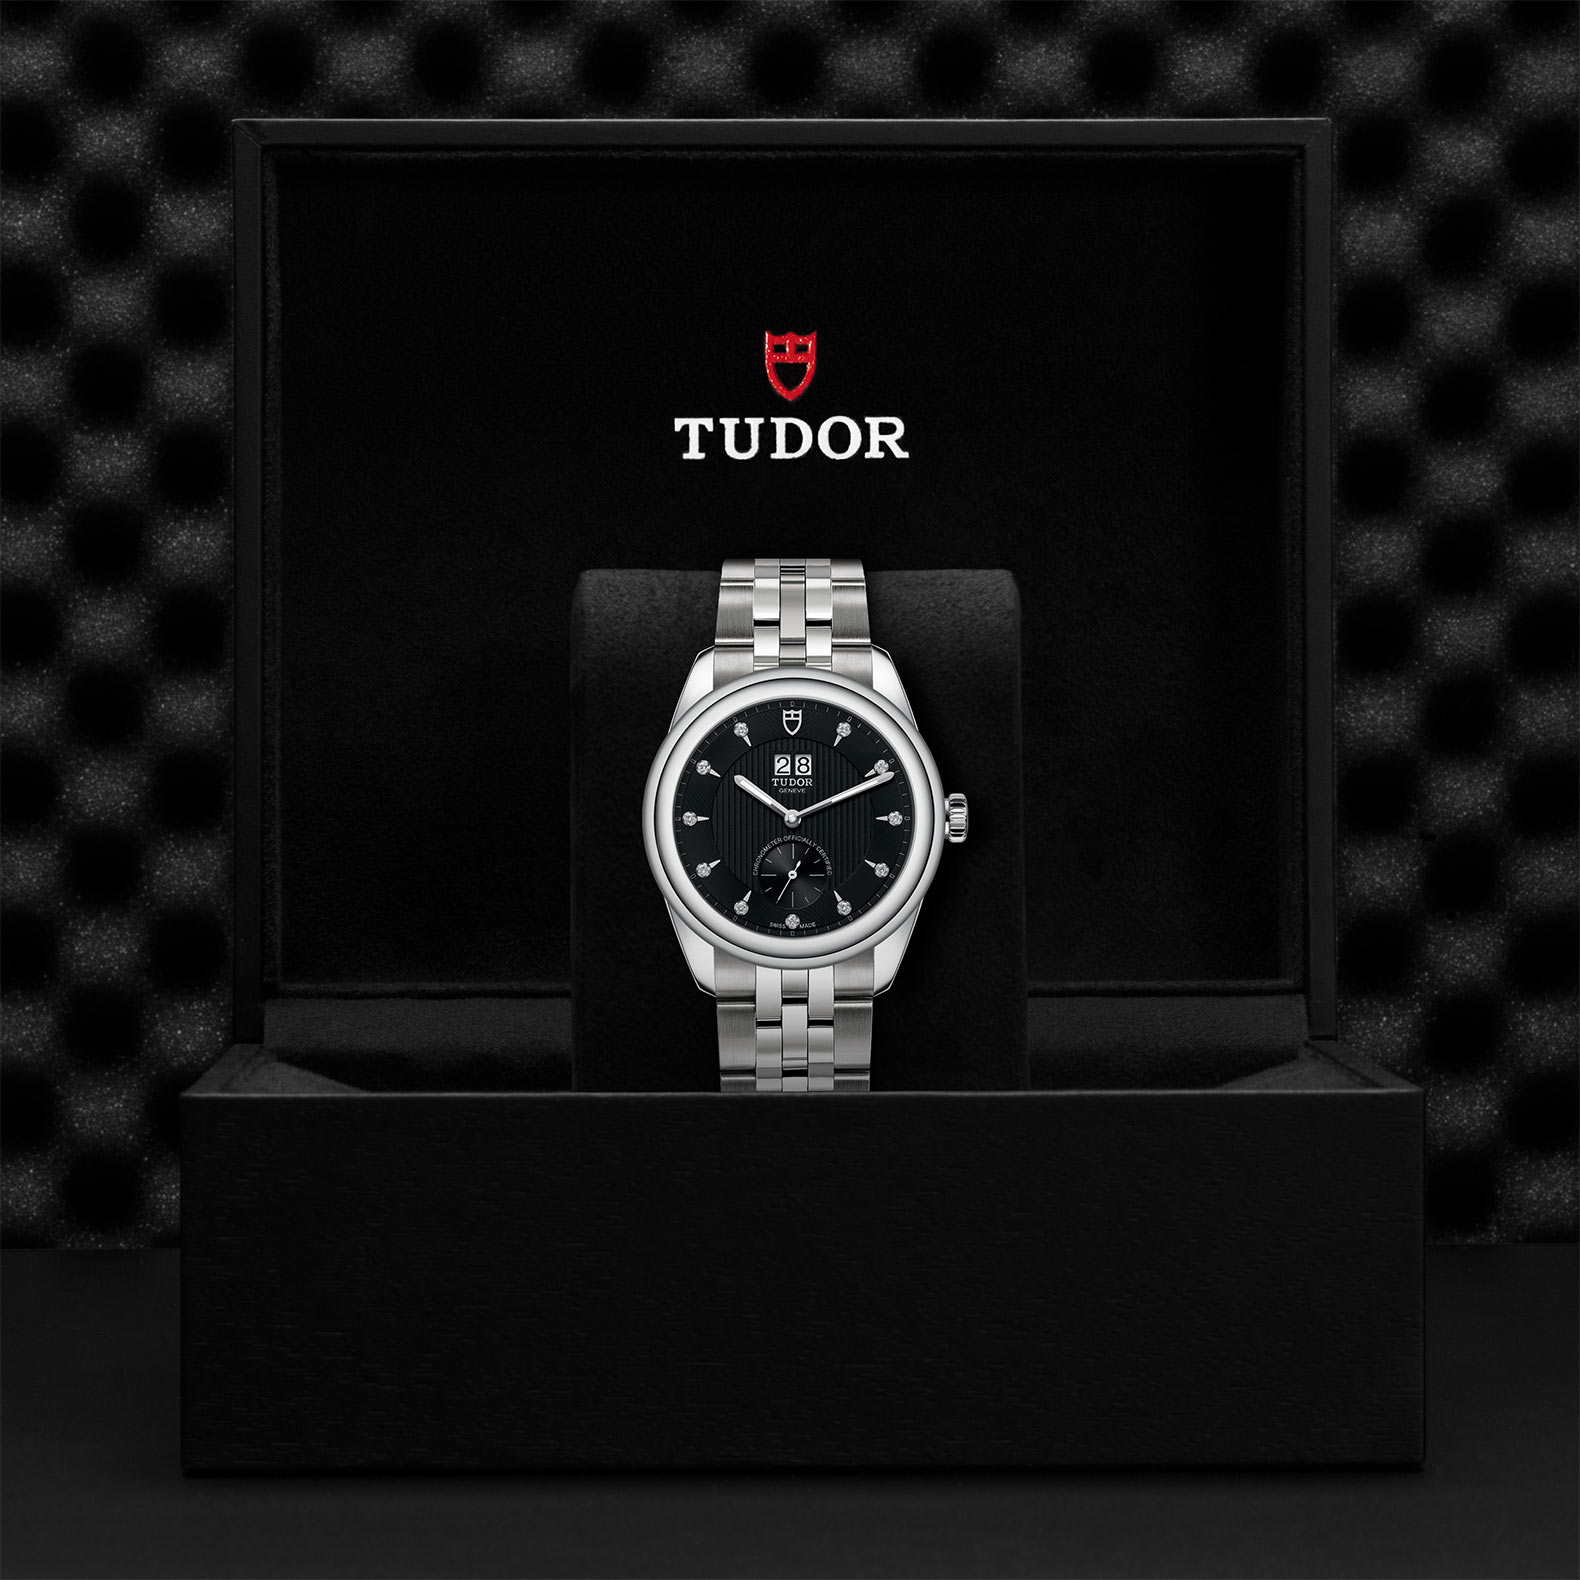 TUDOR Glamour Double Date - M57100-0004